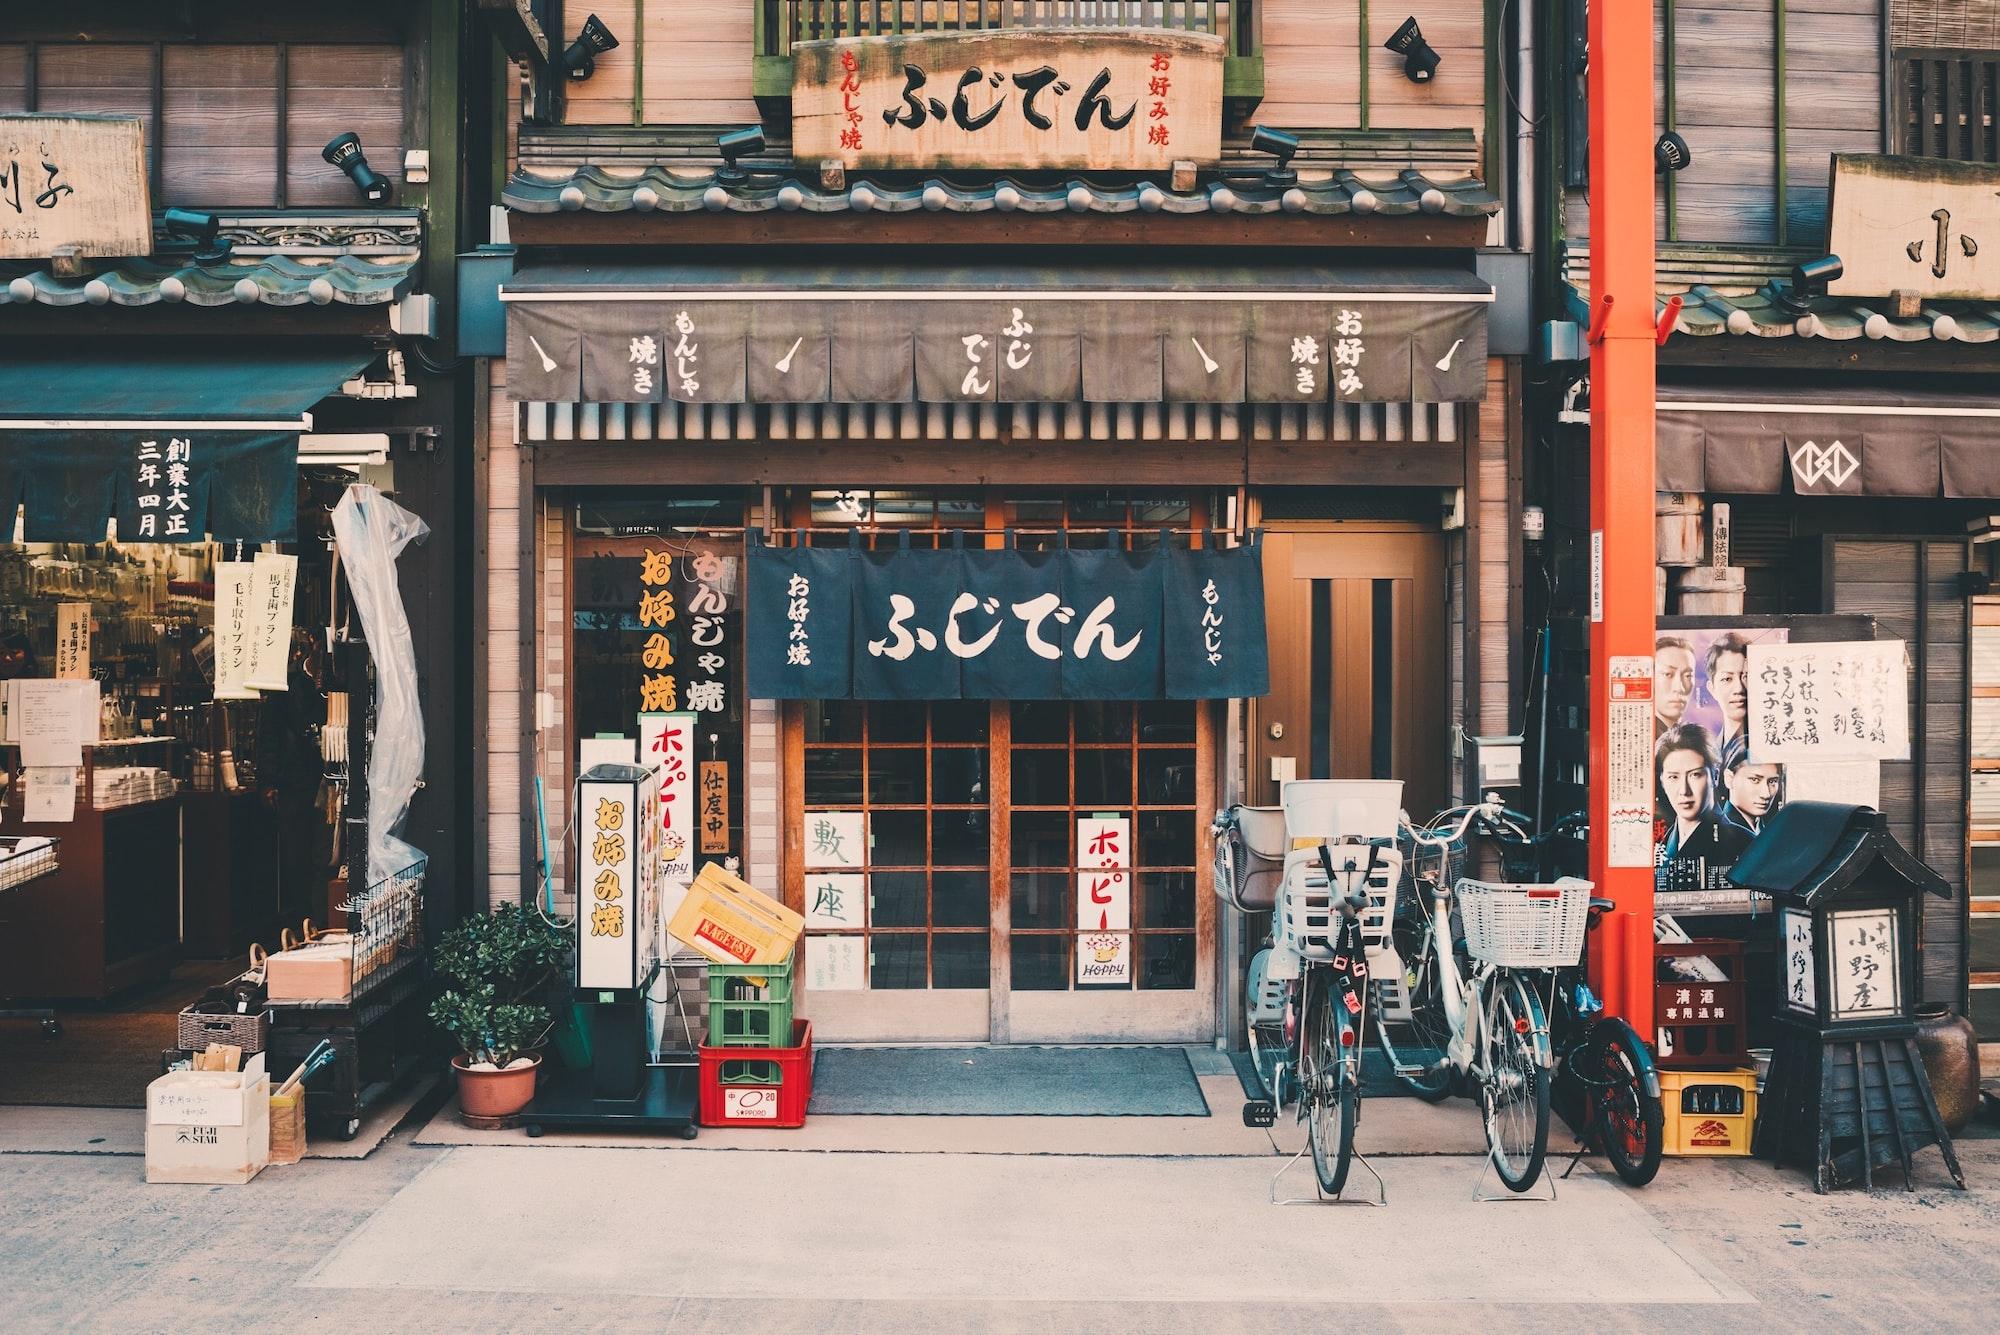 Getting myself lost in Japan [ IG: @clay.banks ]